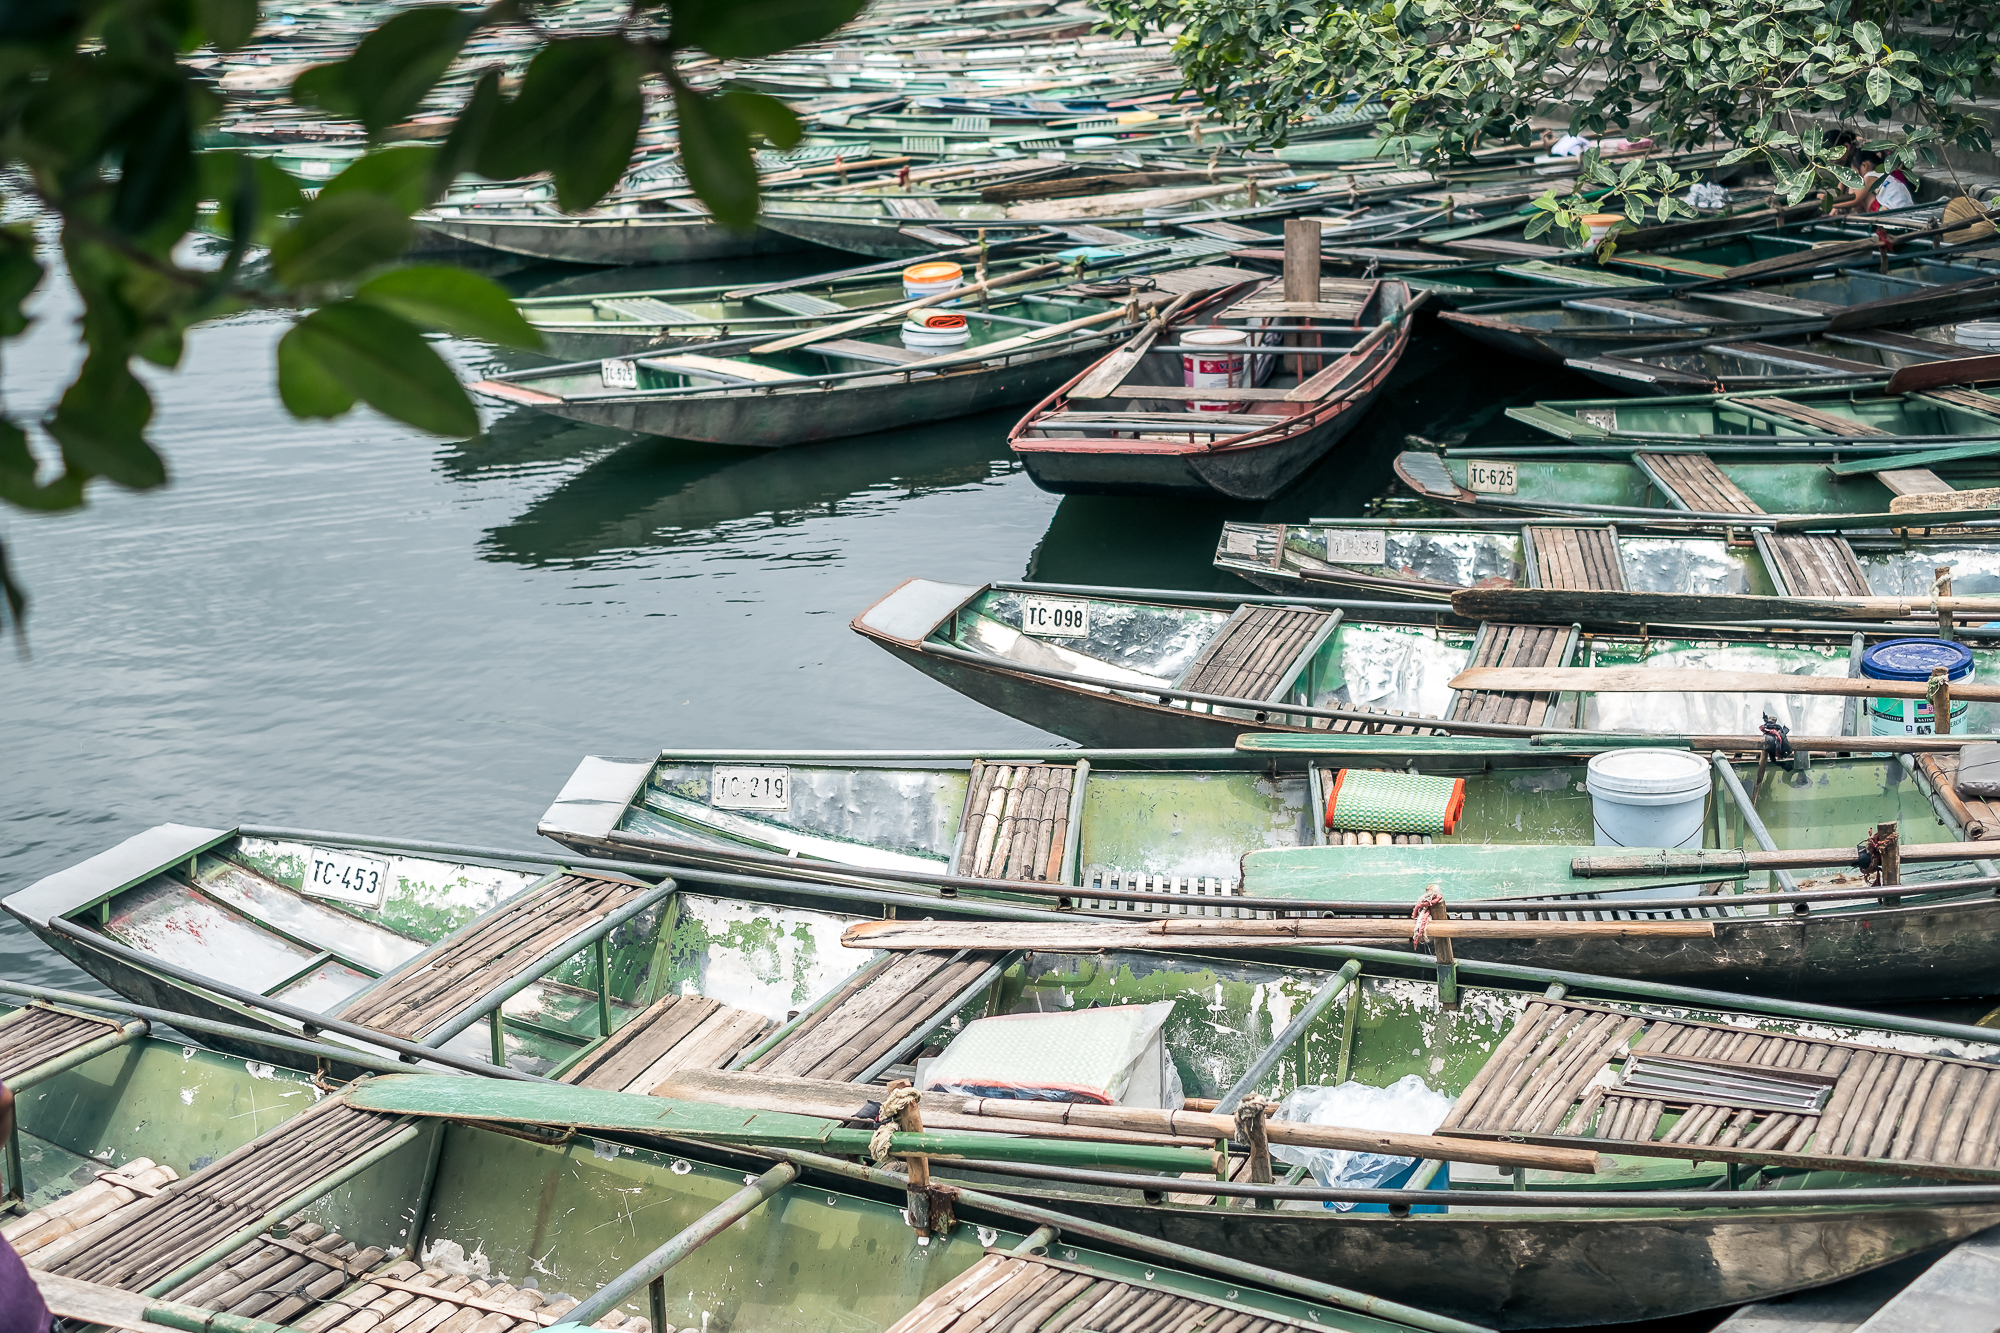 Vietnam_Honeymoon_TheOutsiderBlog_DSCF8698.JPG